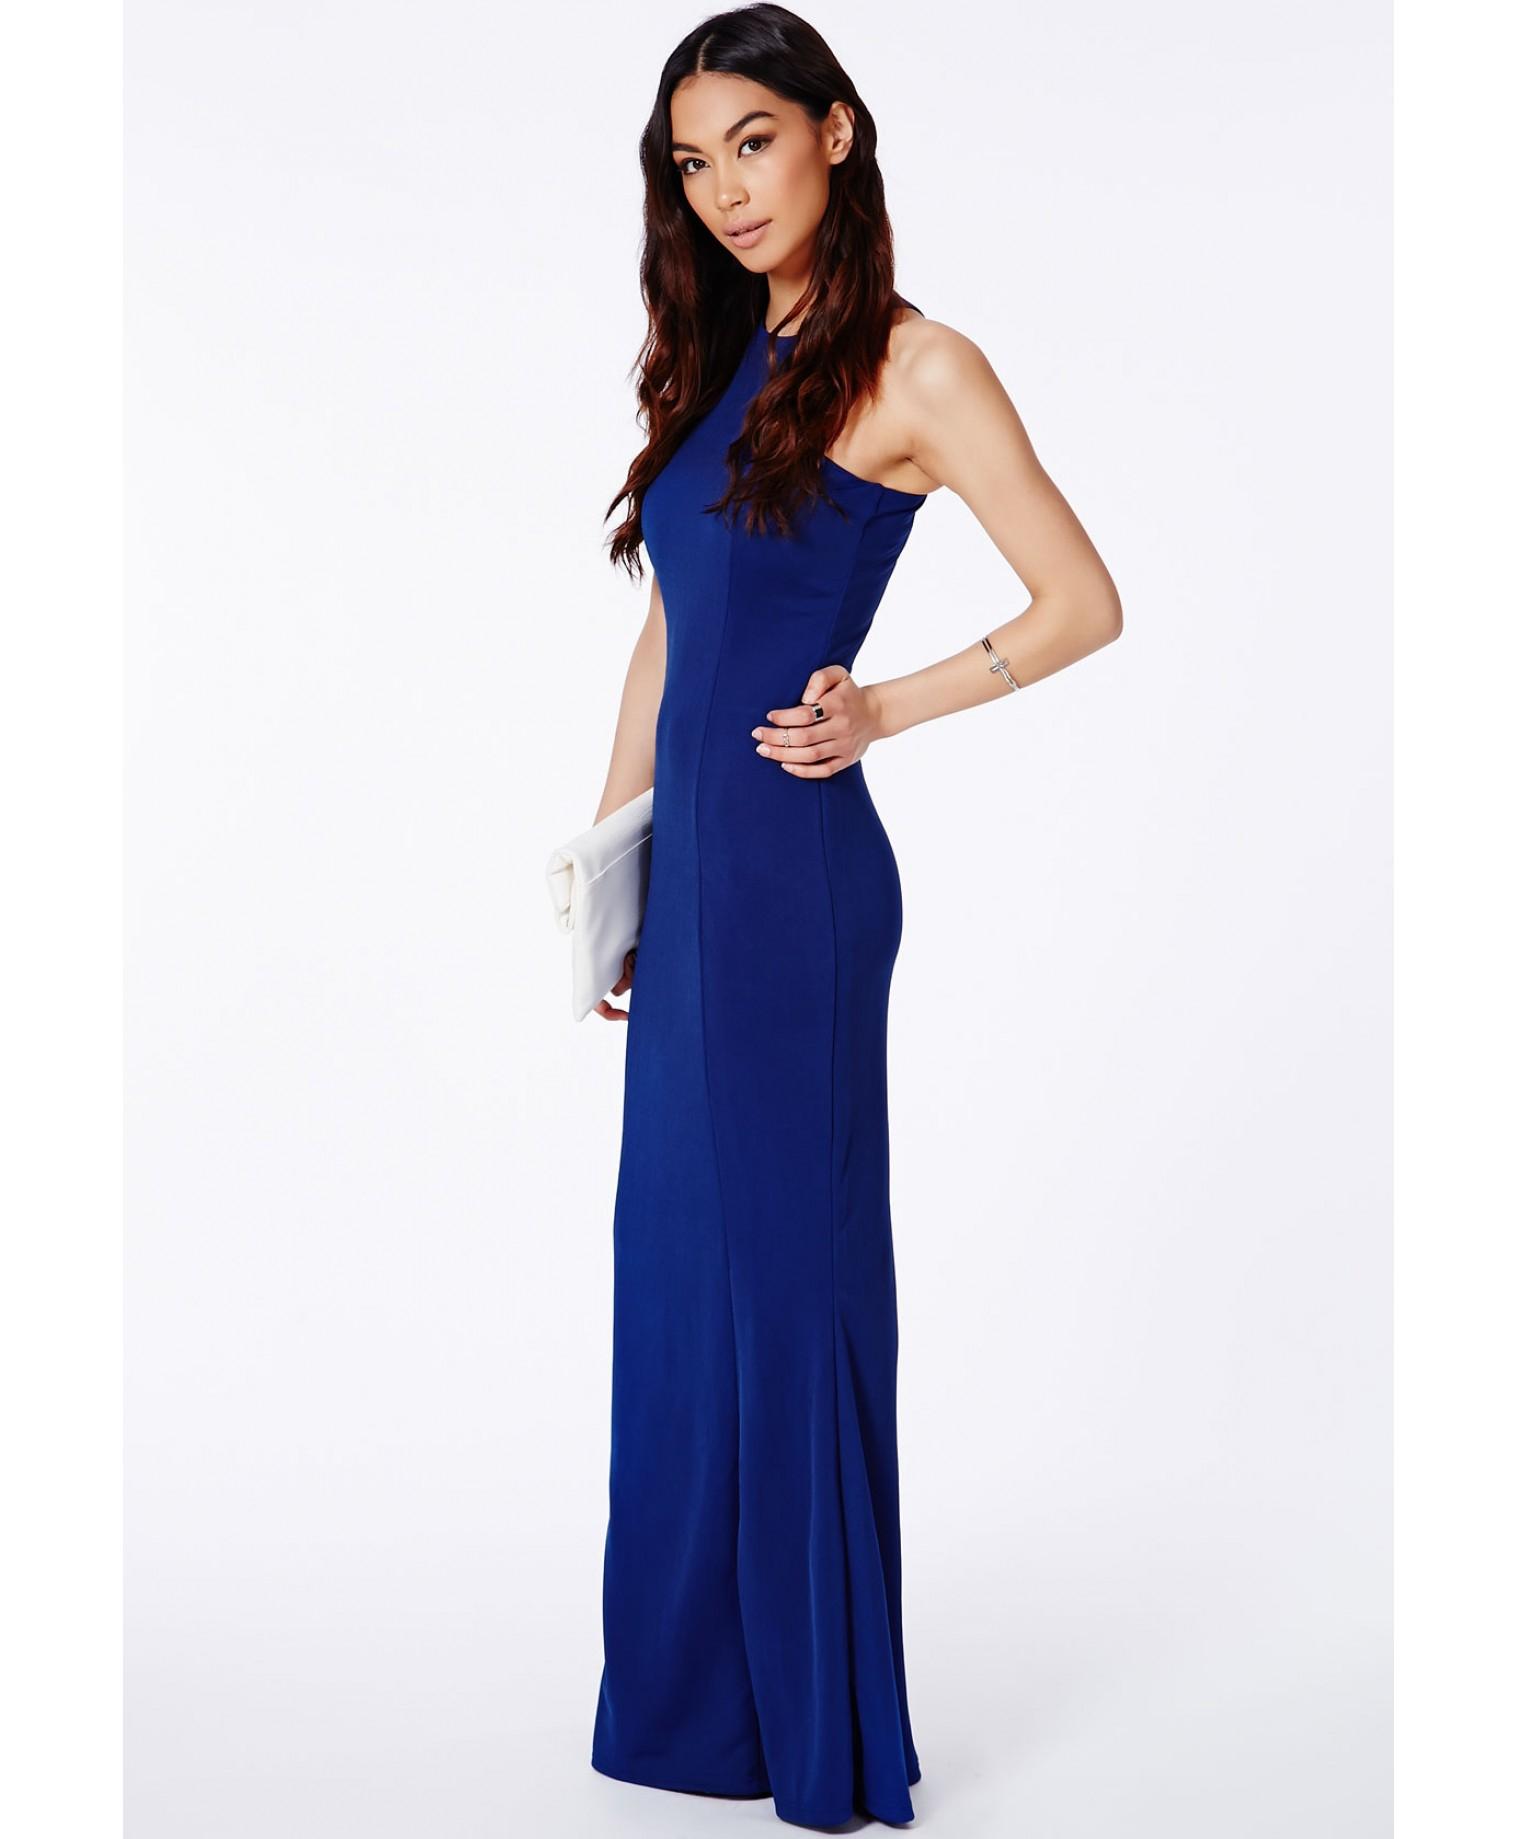 Lyst - Missguided Kaisa Crepe High Neck Maxi Dress Cobalt in Blue ac54e30e8